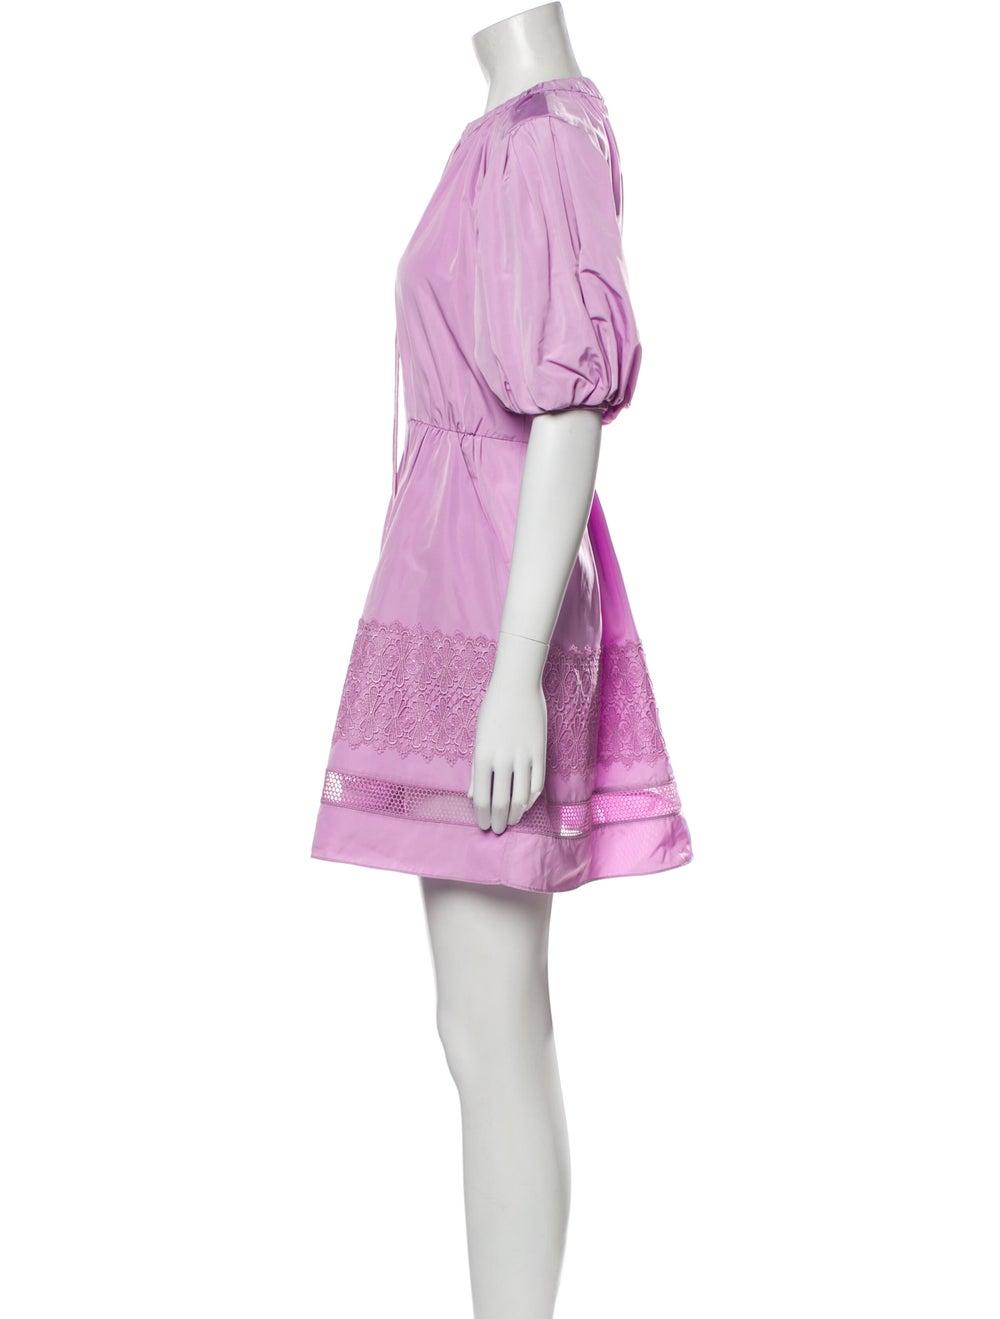 Self-Portrait 2021 Mini Dress Purple - image 2